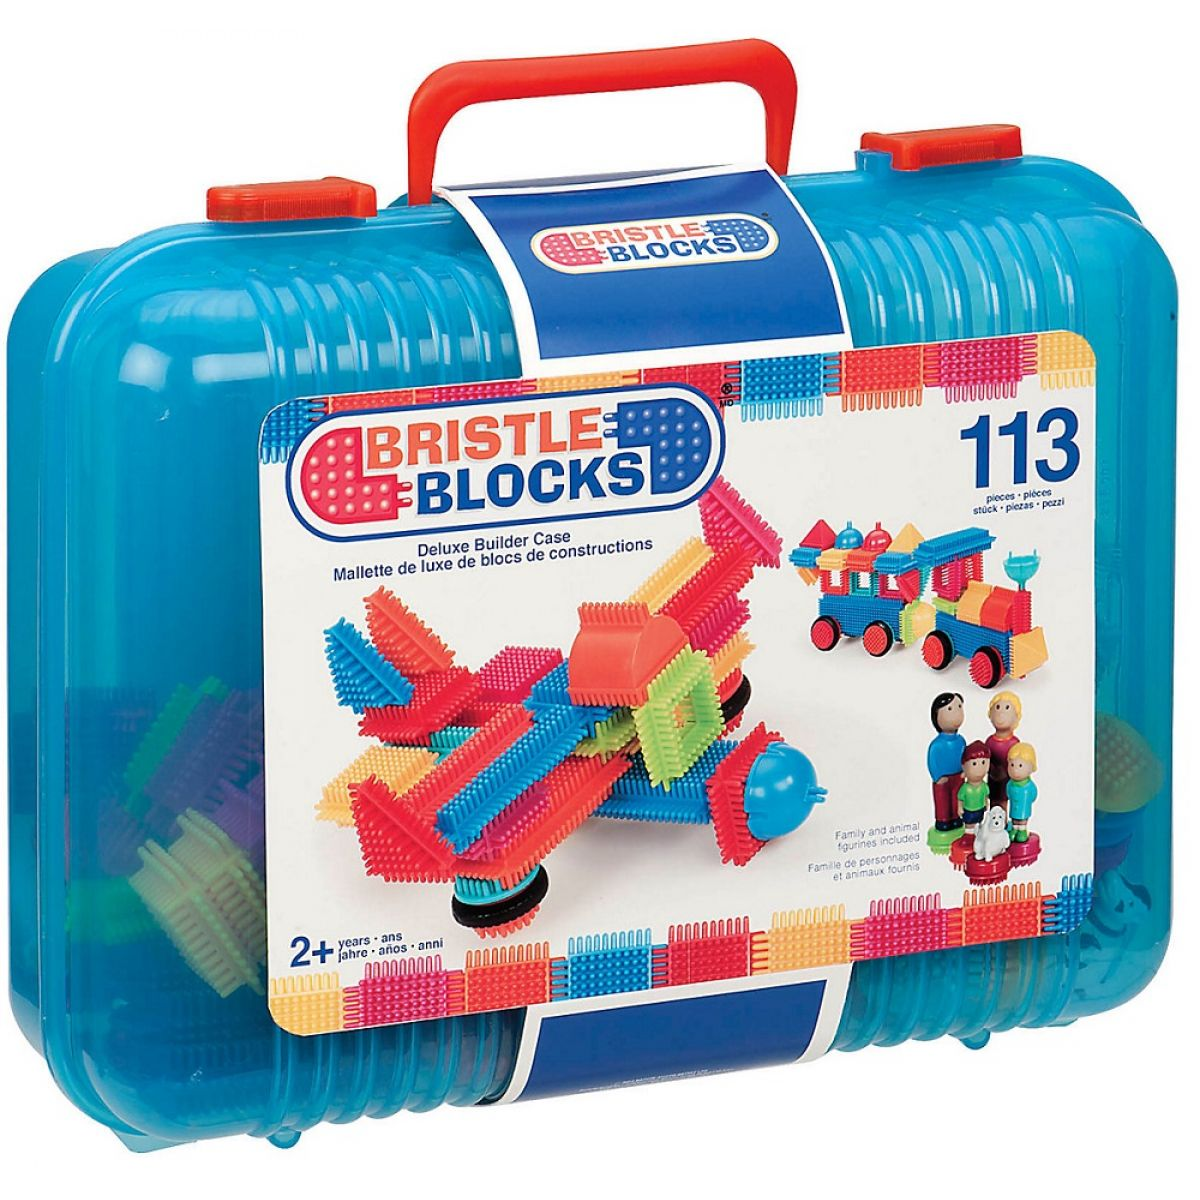 Bristle Blocks Stavebnice v kufříku 113ks